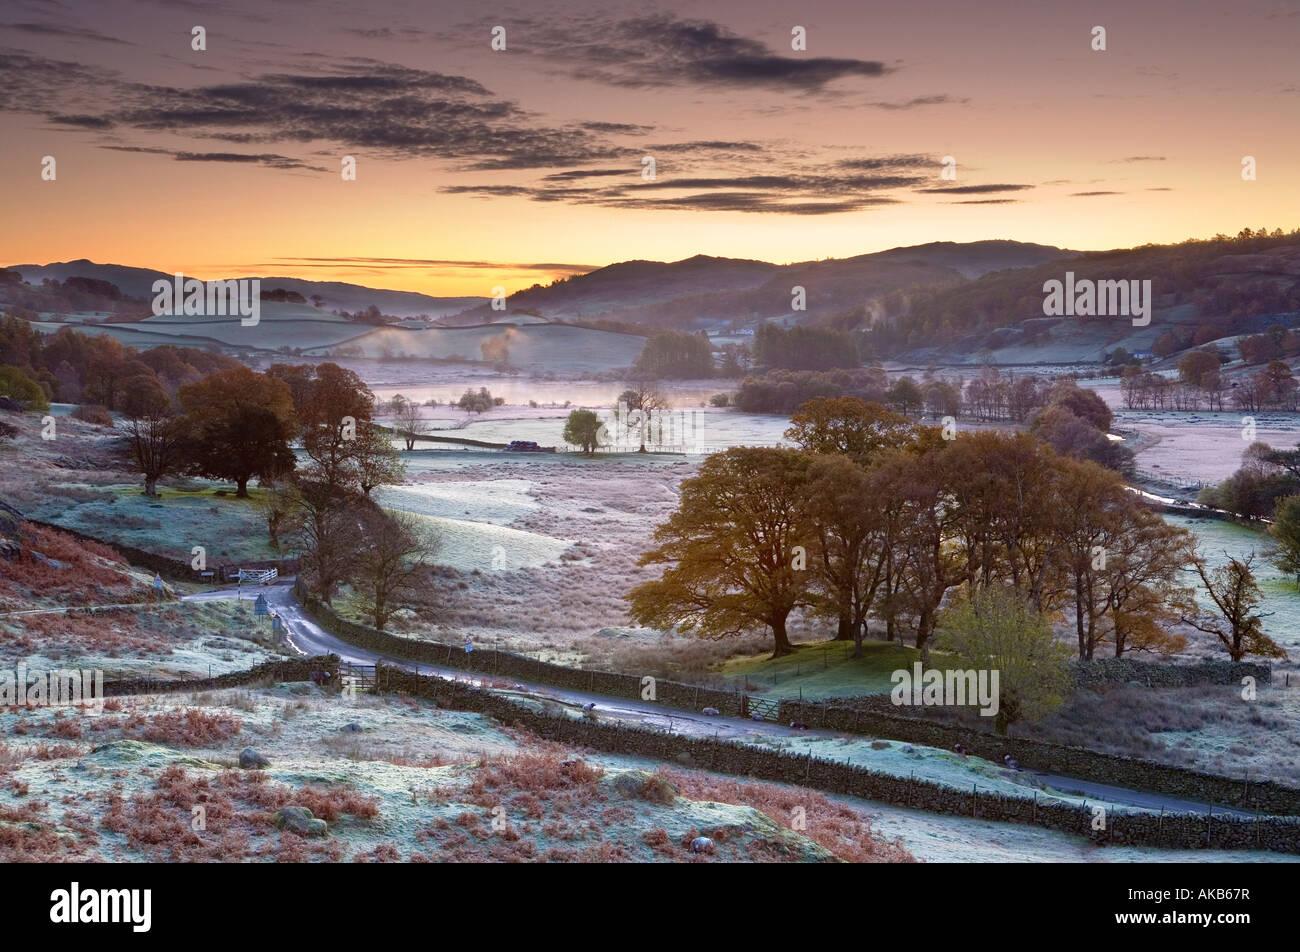 Frosty mattina, Little Langdale, Lake District, Cumbria, Inghilterra Immagini Stock